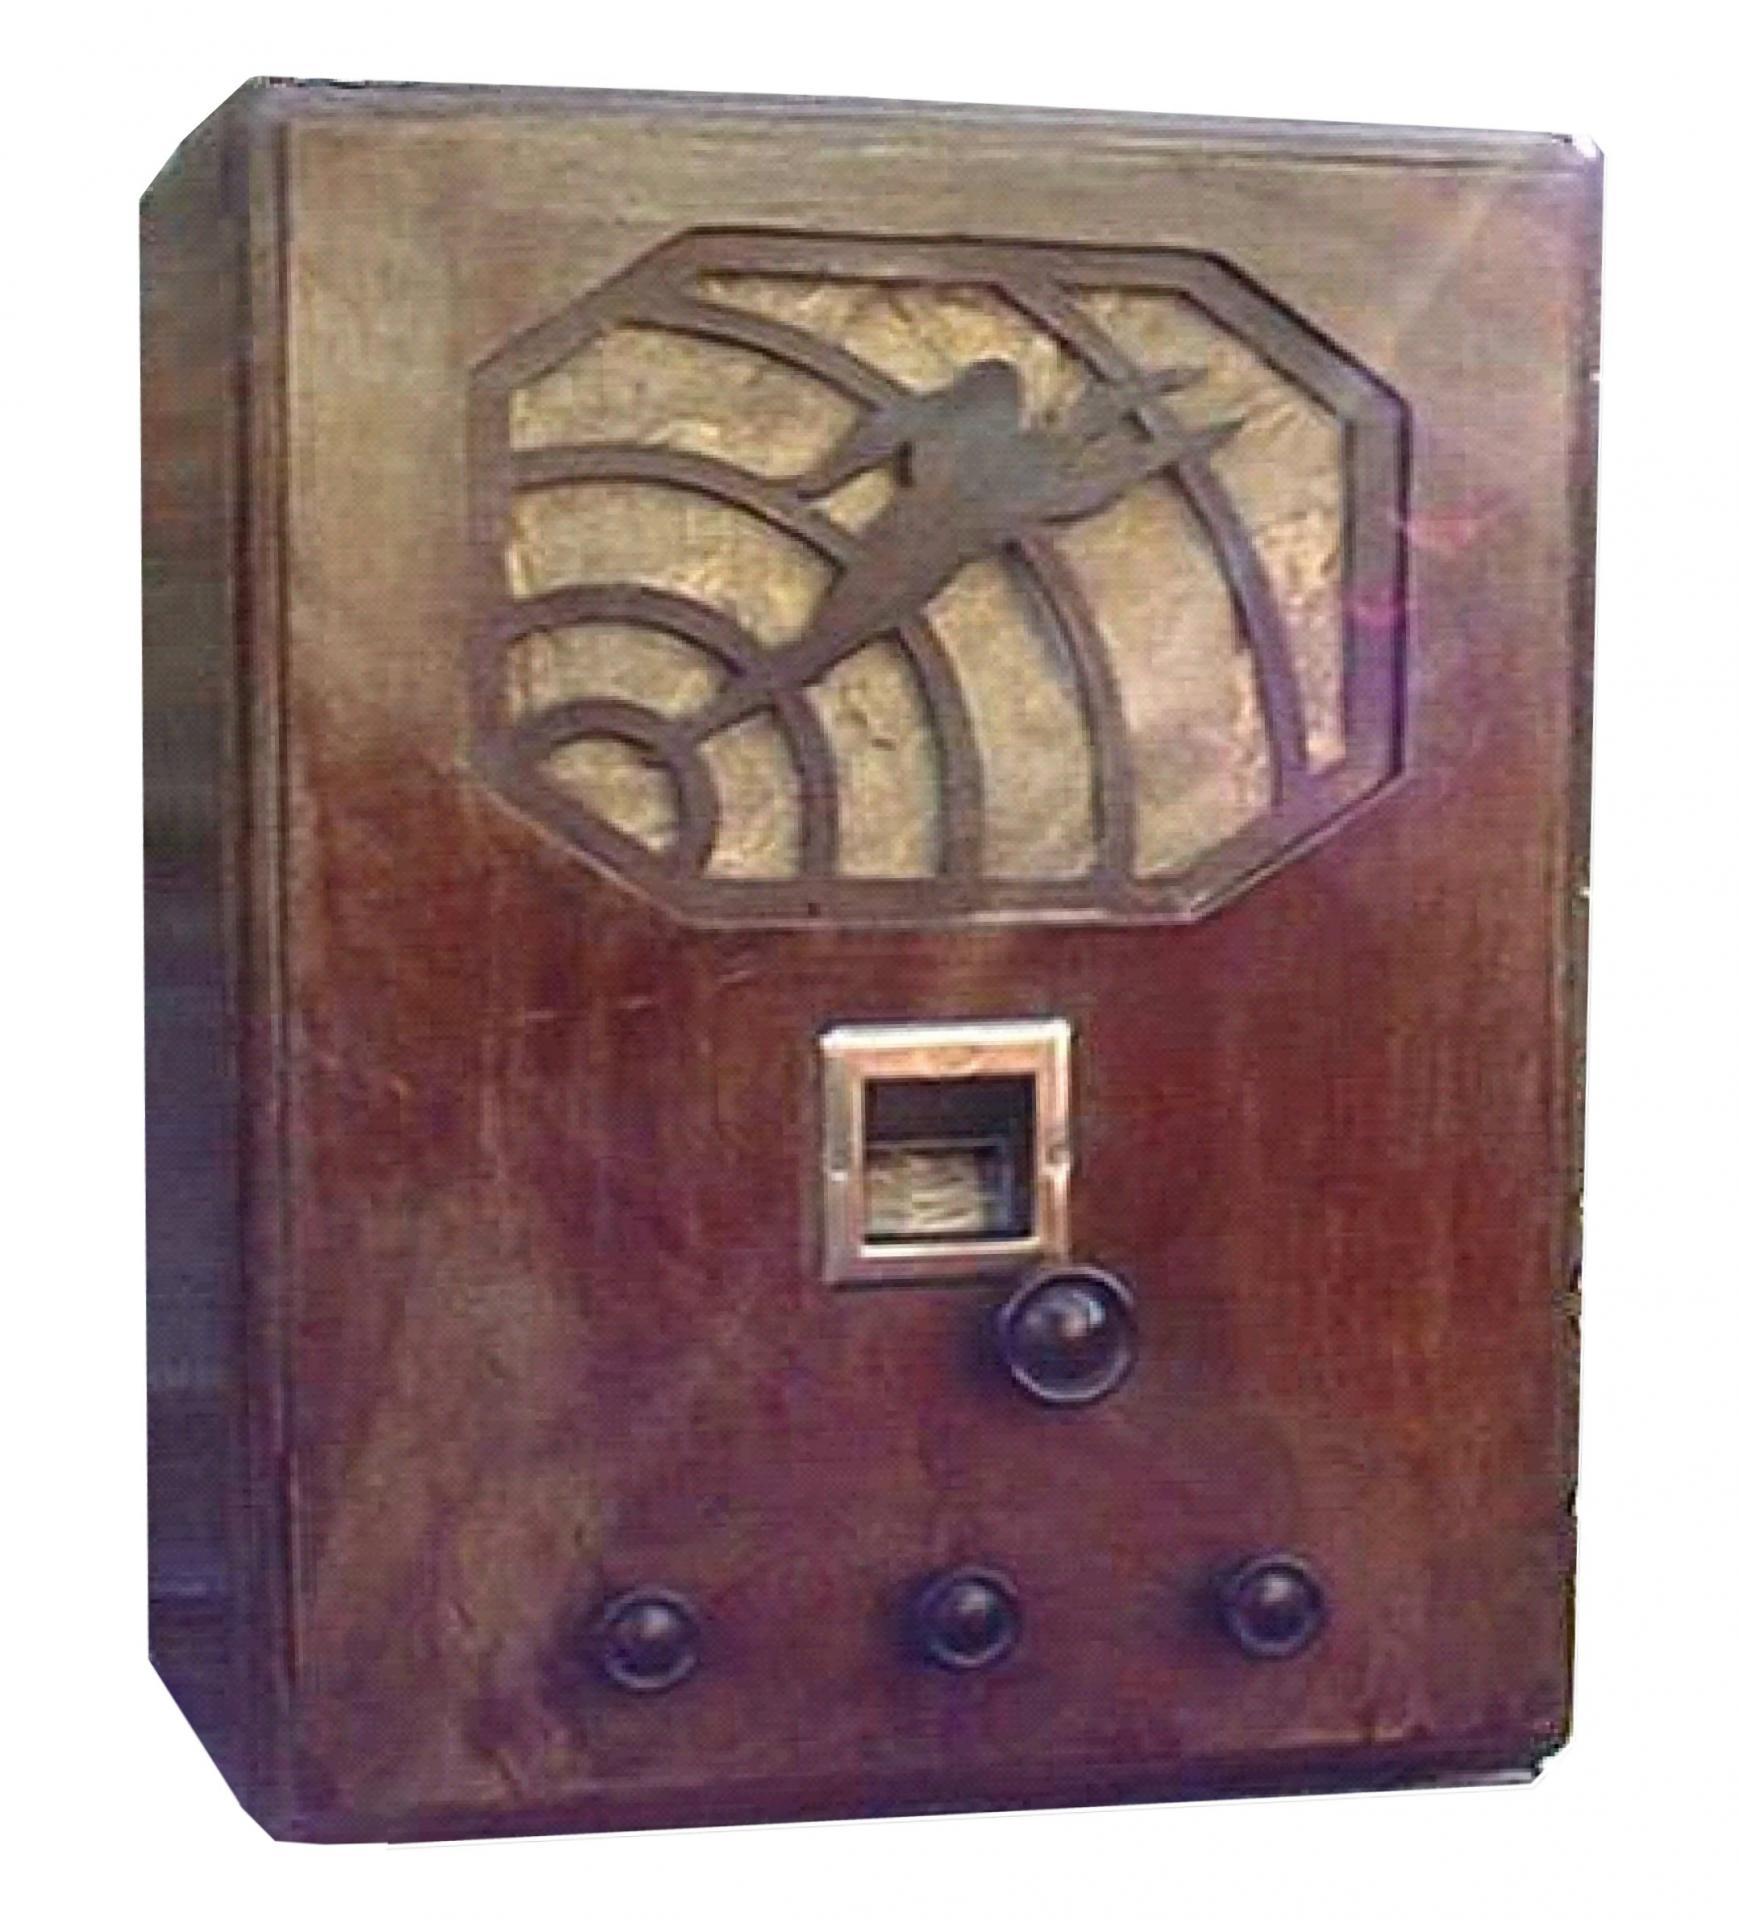 Radio LL 3688